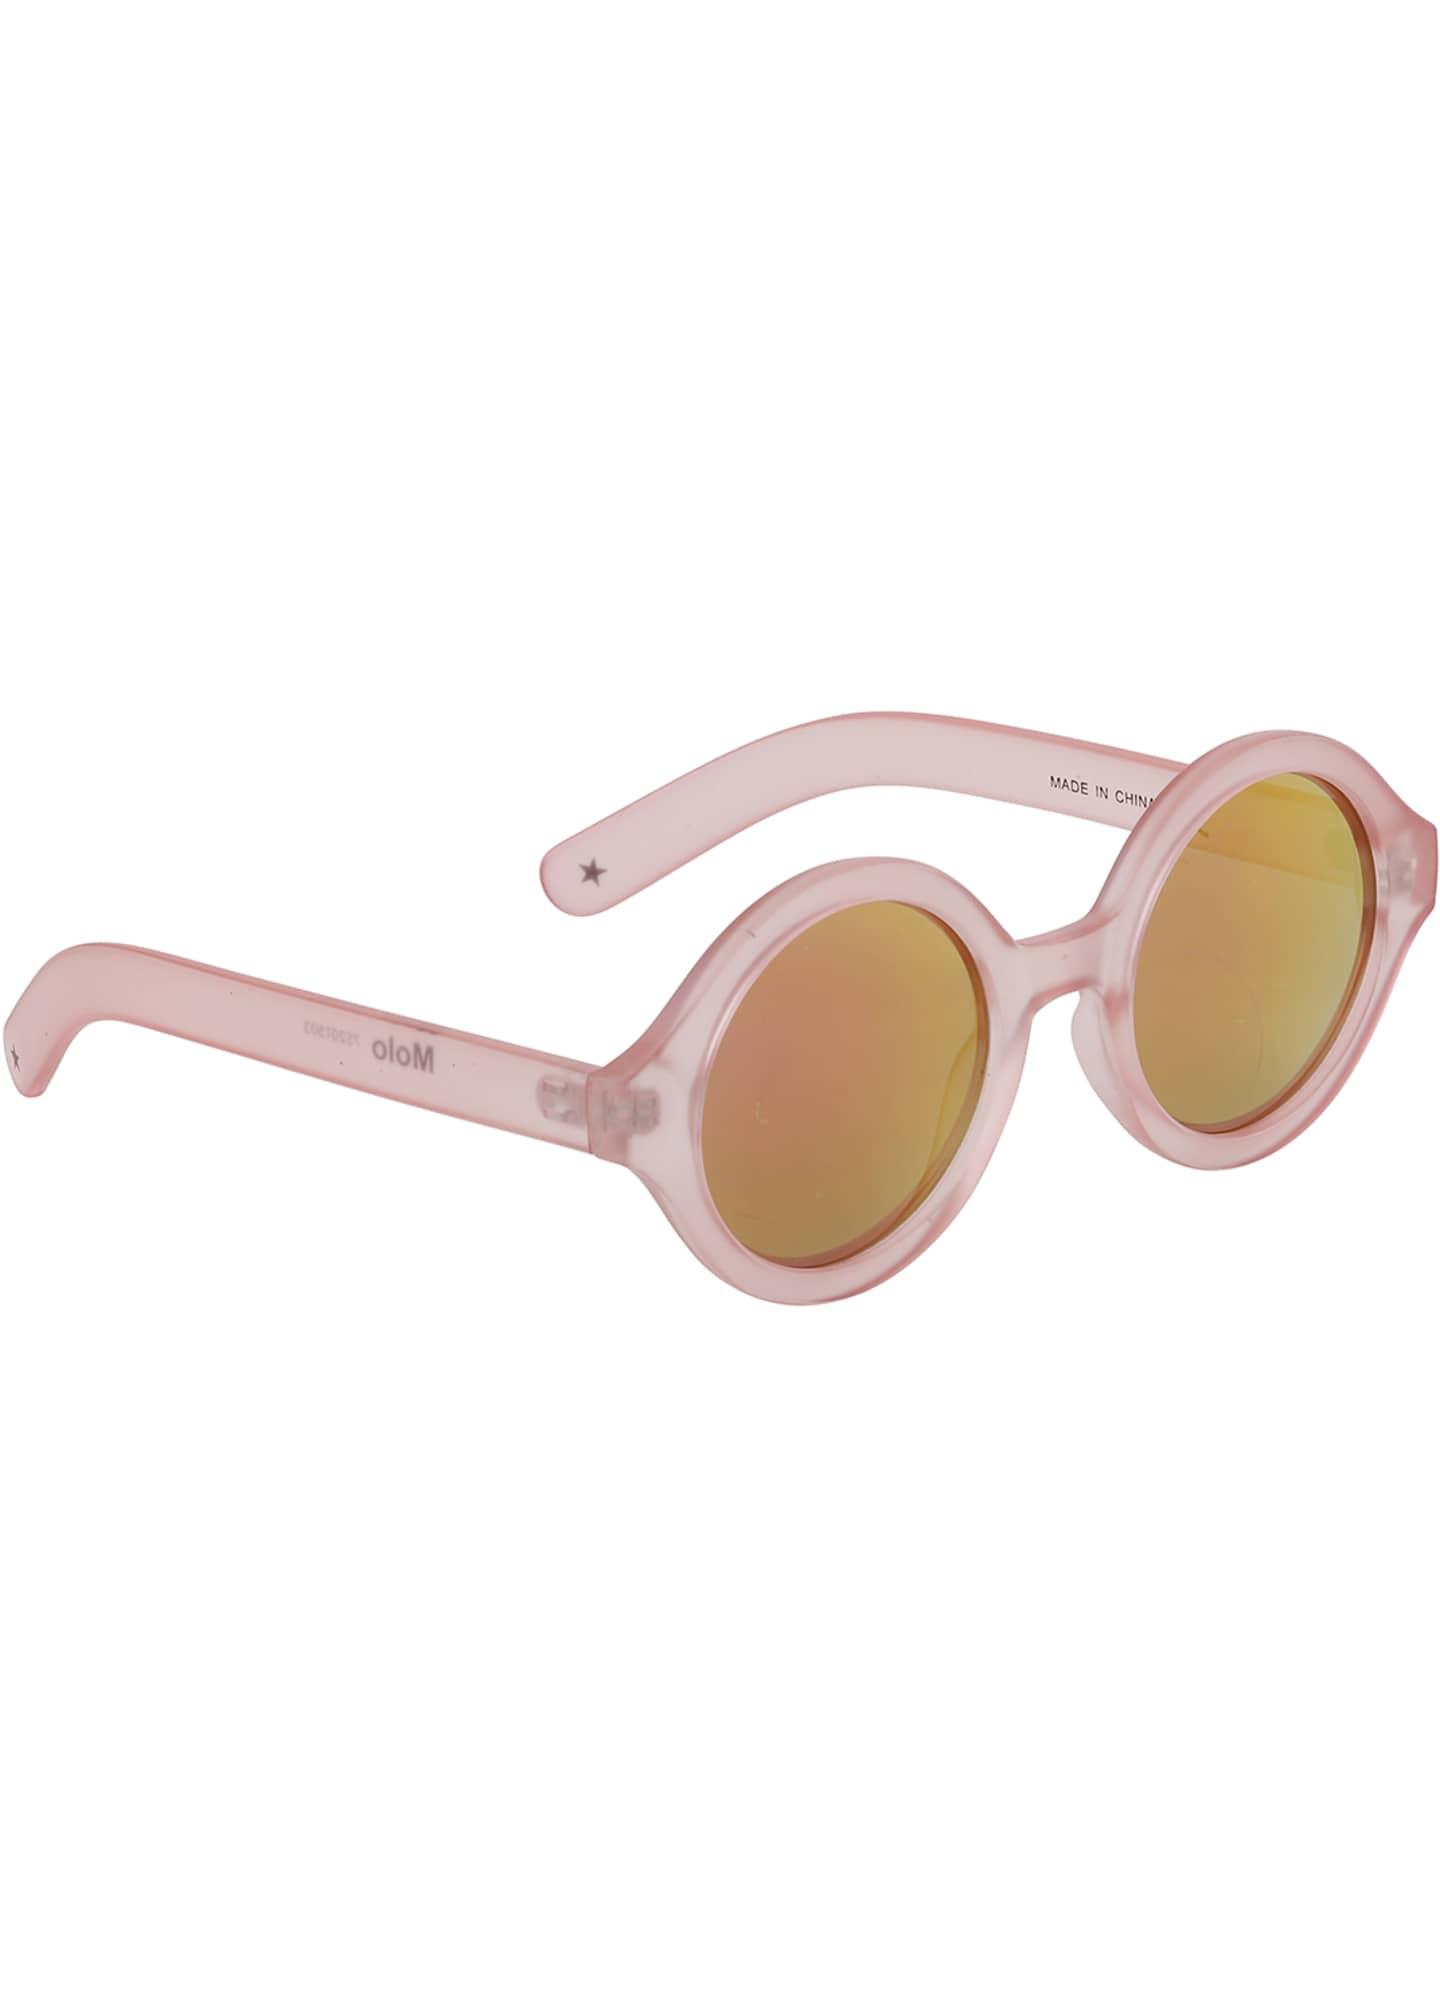 Molo Kid's Shelby Round Sunglasses